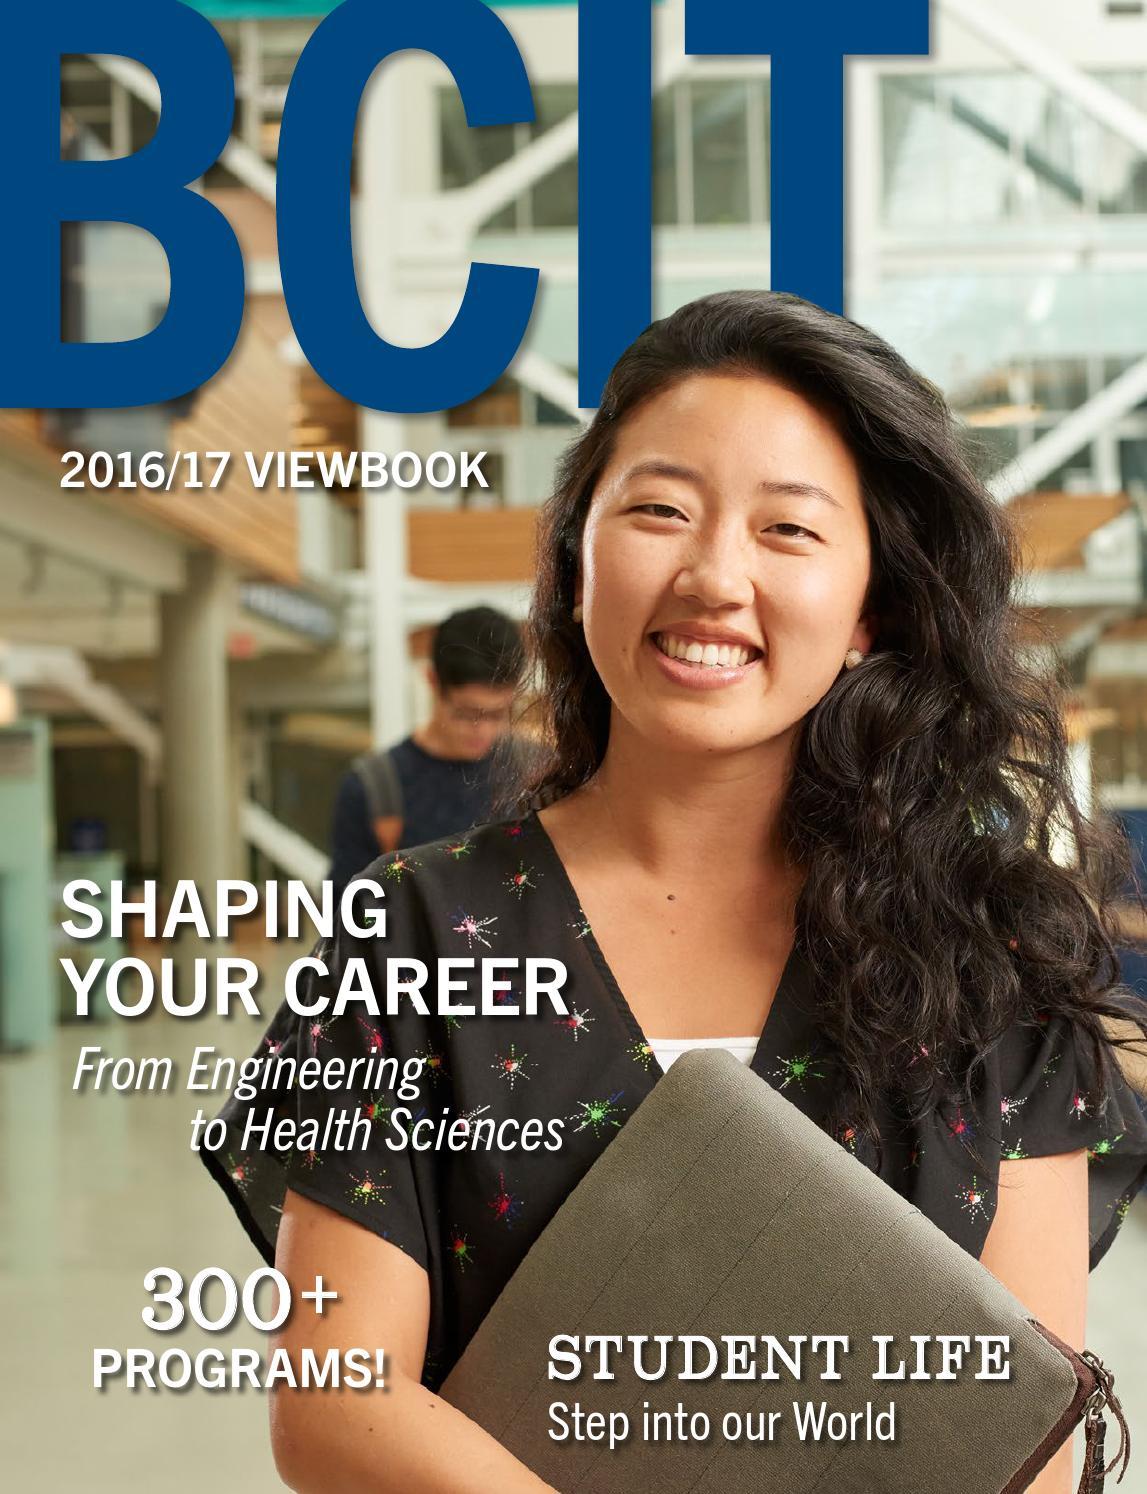 Bcit Viewbook 2016 17 By Bcit Issuu